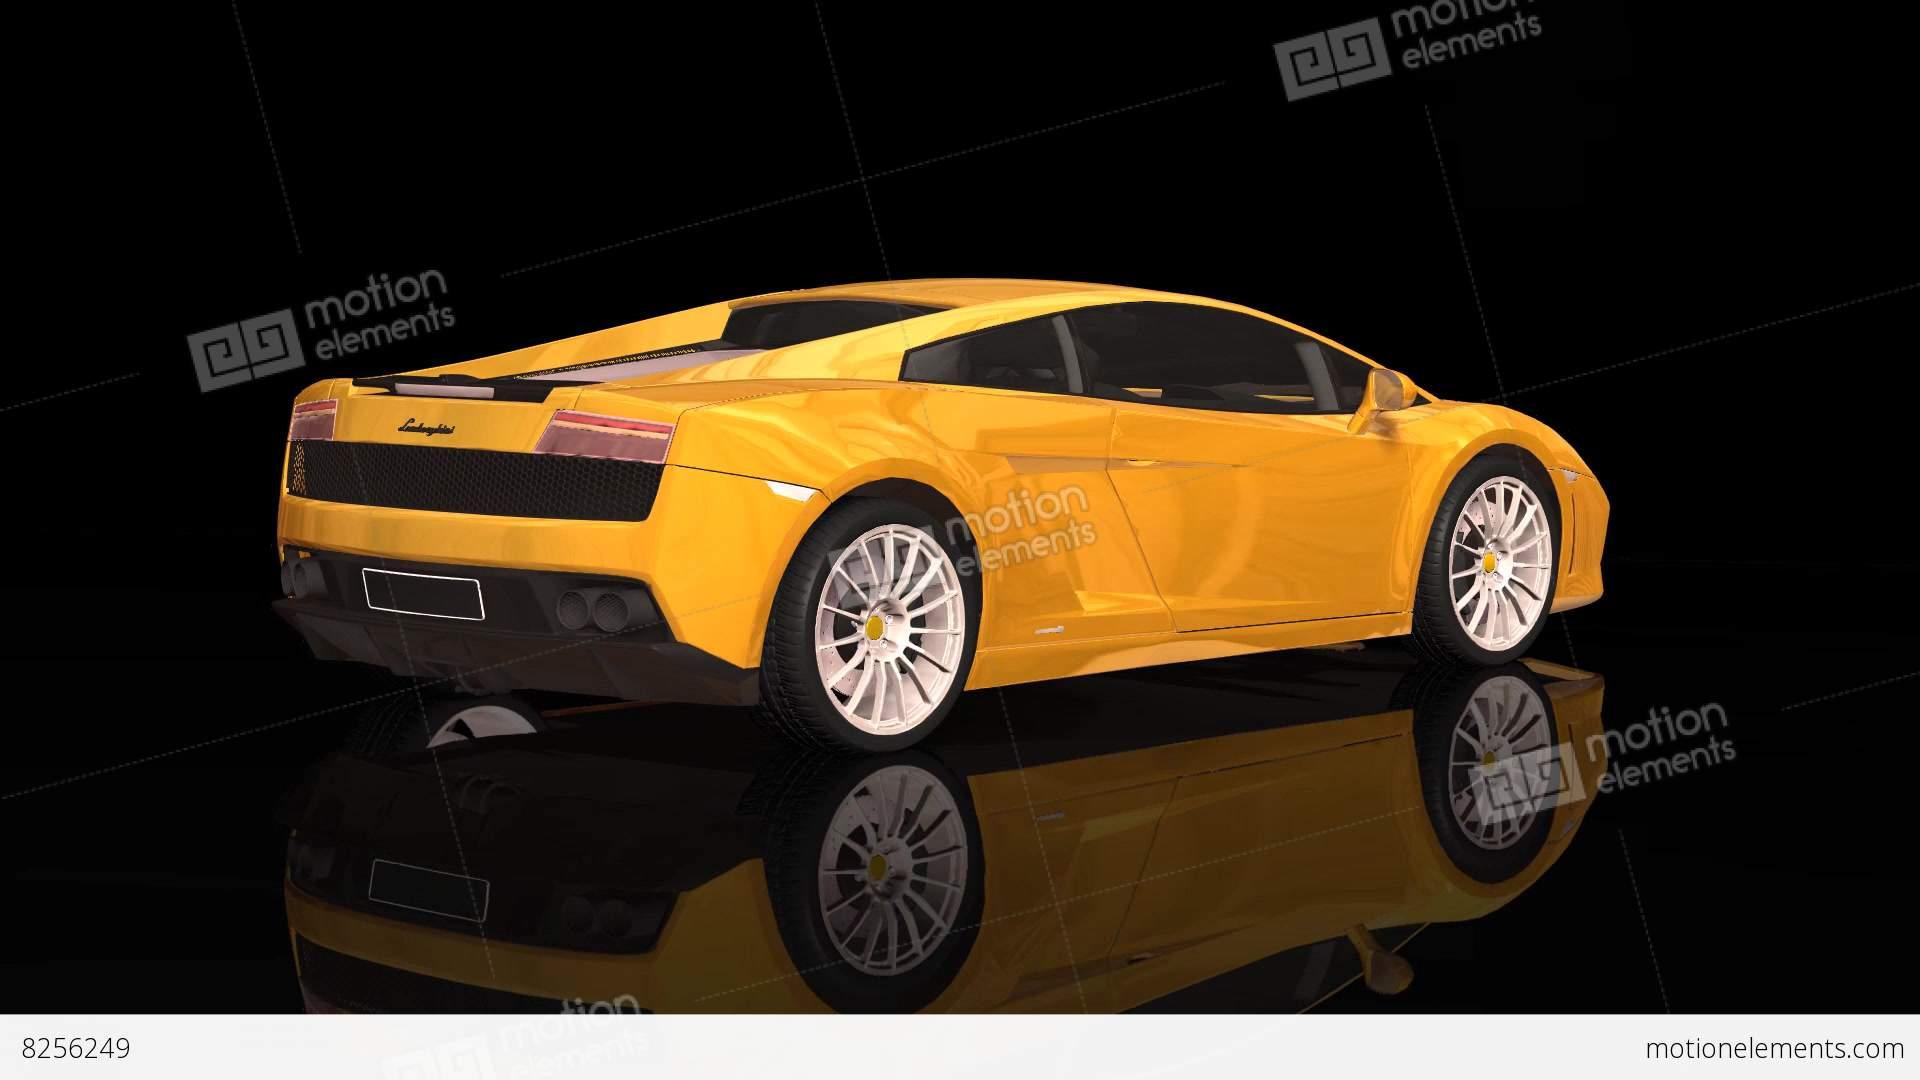 Luxury Sport Car Lamborghini Yellow Color Moving Rotation Stock